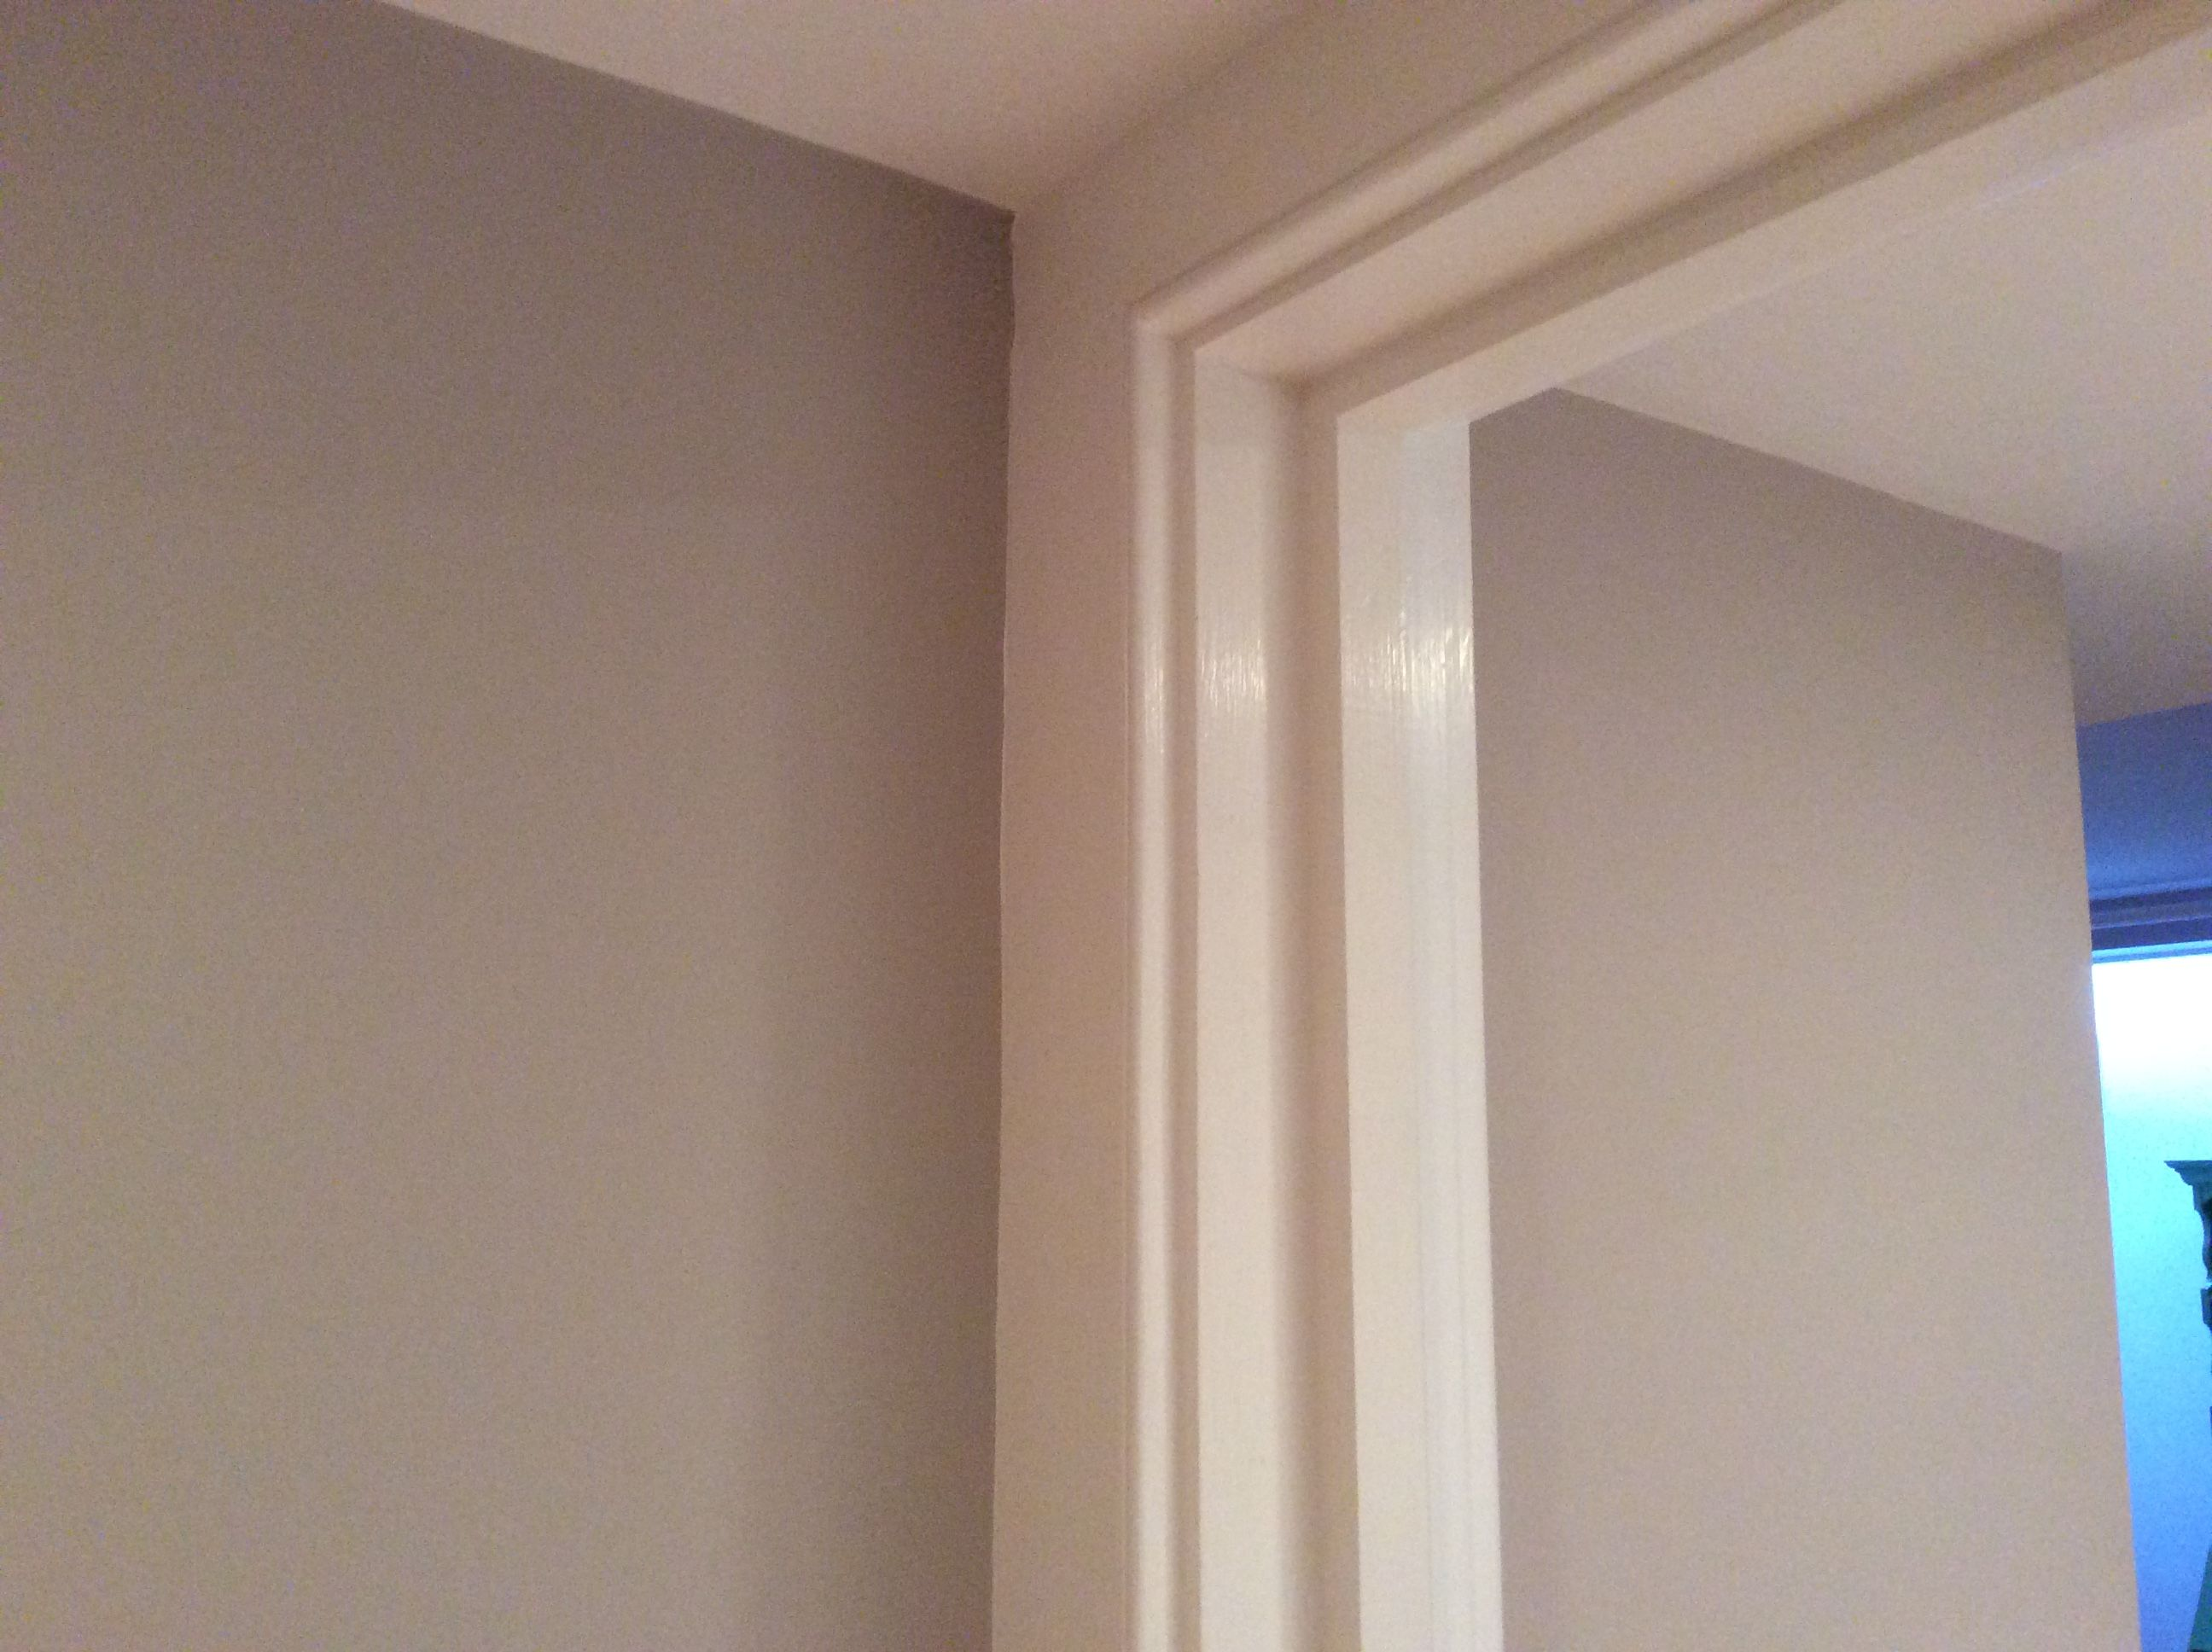 Collingwood bm oc 28 select eggshell on the left wall - Eggshell paint on walls ...